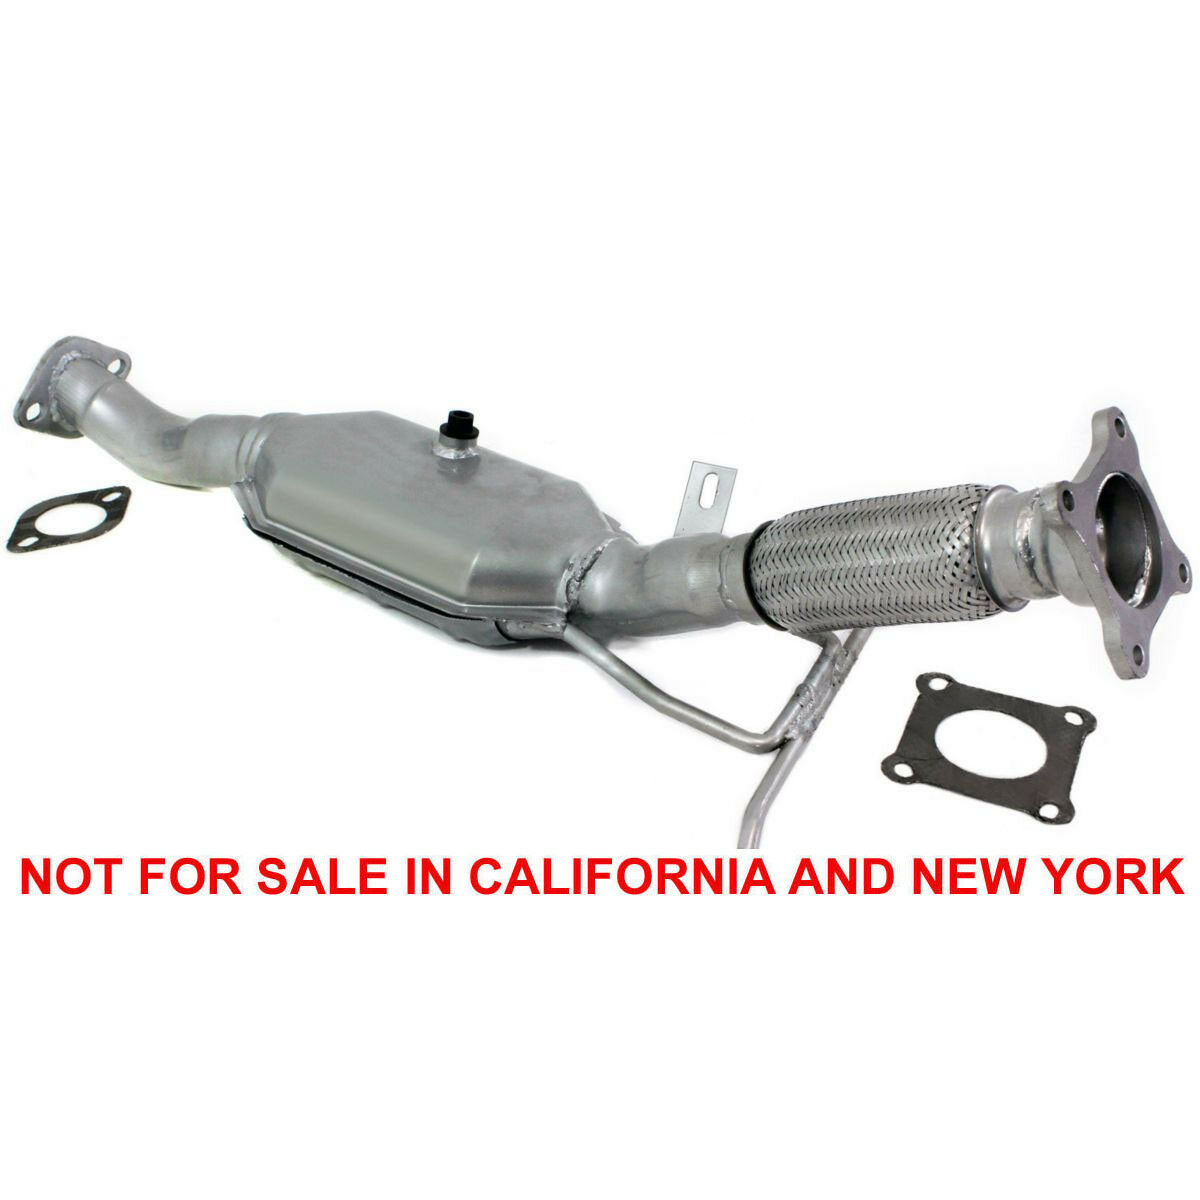 Fits 2001 2002 2003 2004 2005 2006 2007 Volvo S60//V70 2.4L Catalytic Converter